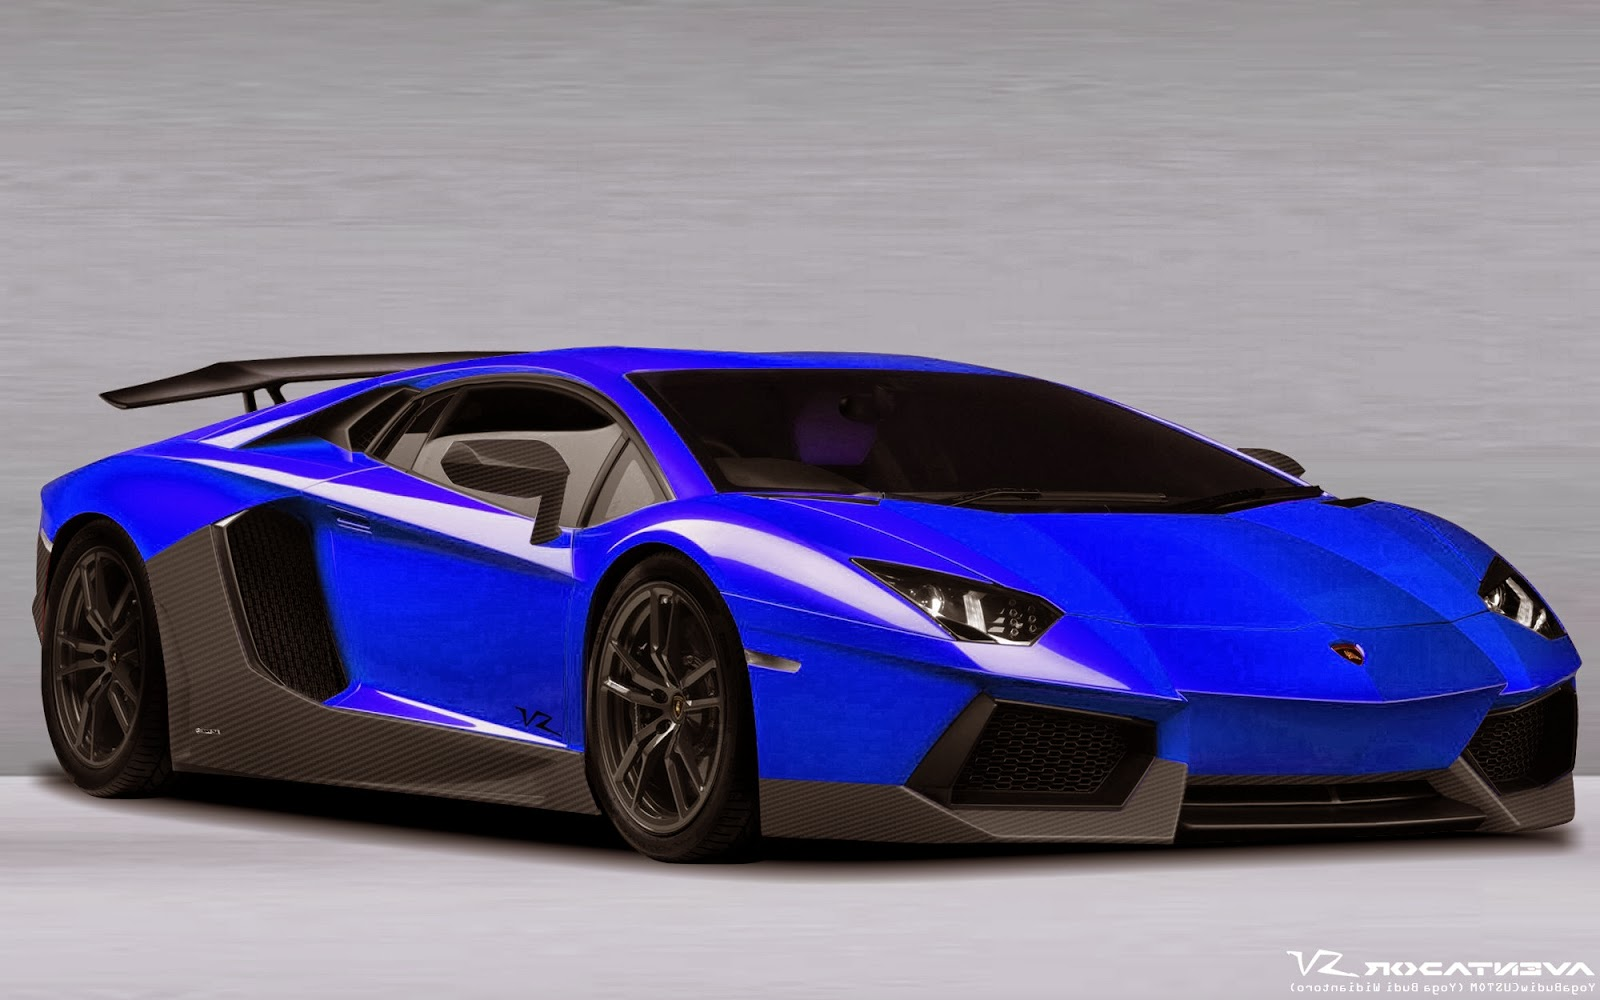 Black And Blue Lamborghini Wallpaper 9 Background Wallpaper